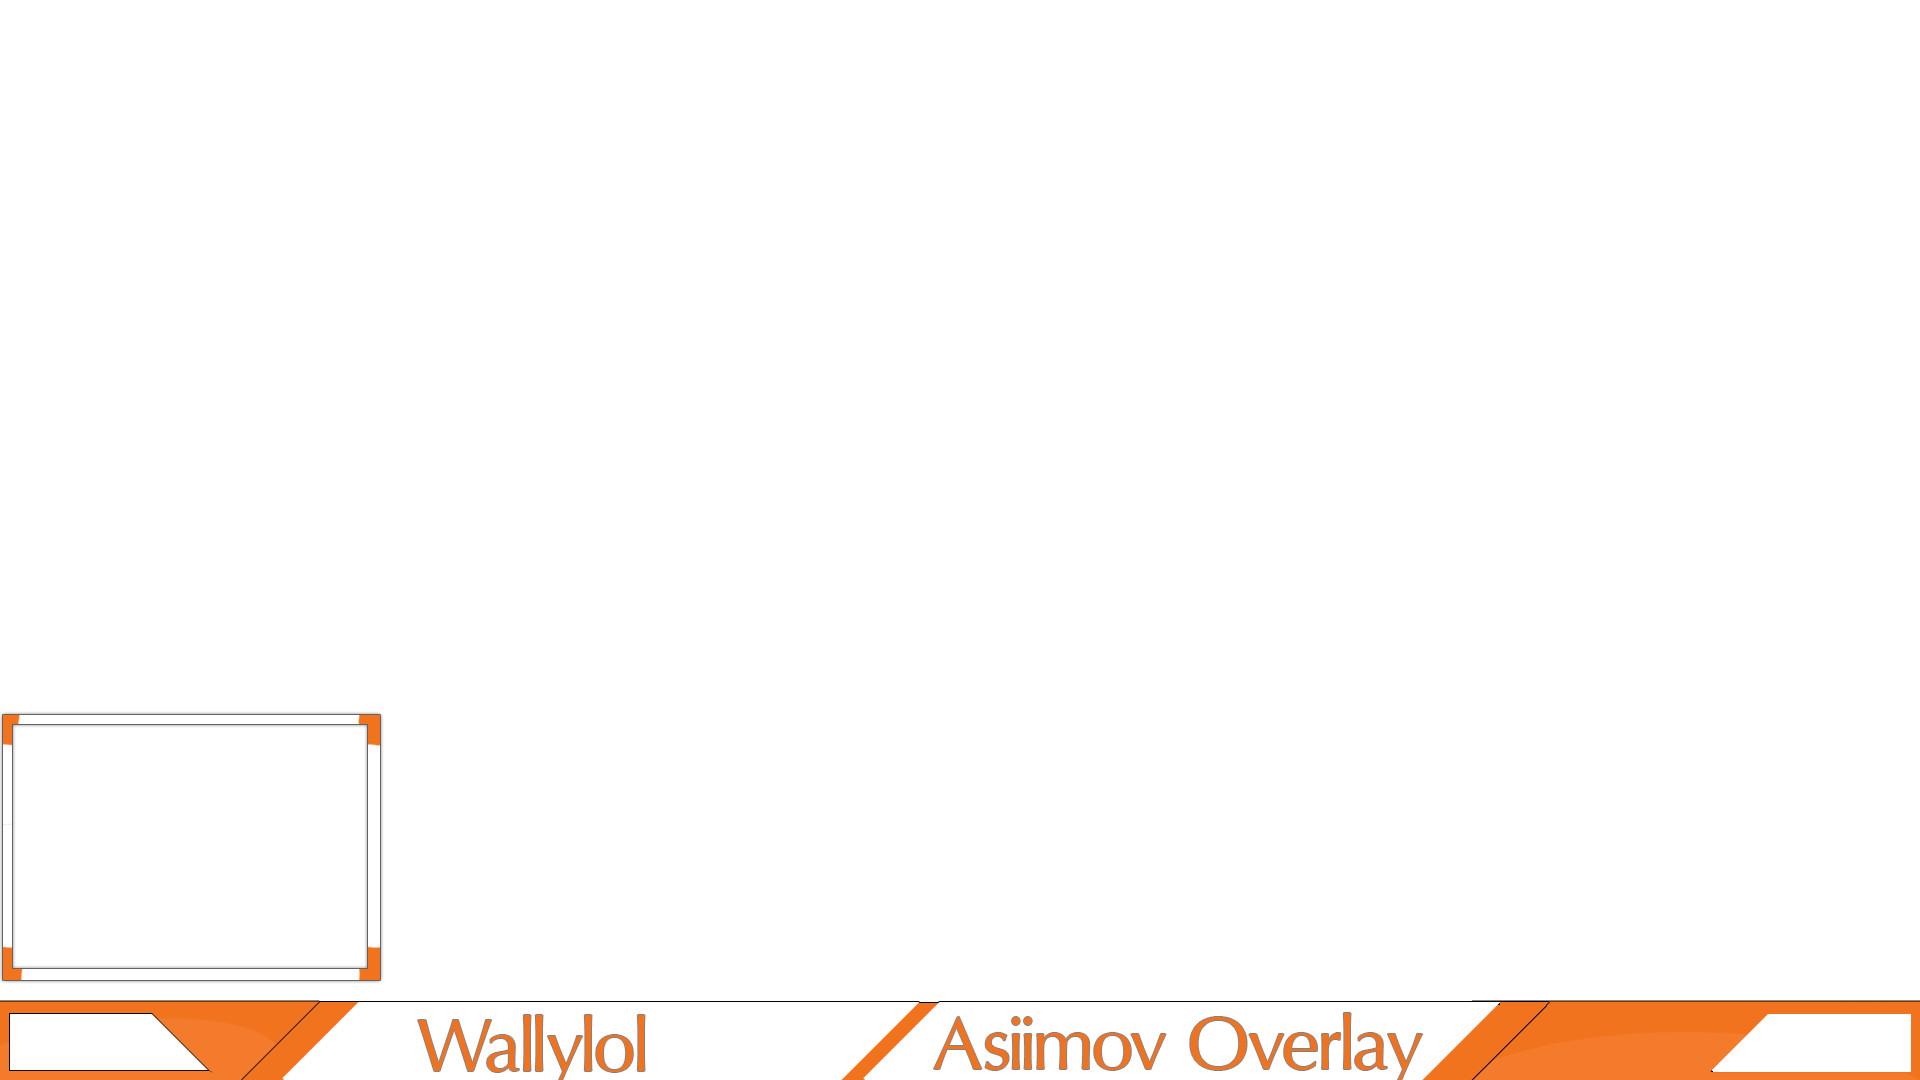 … Twitch CSGO Asiimov Overlay #Template2k15 by wallylol